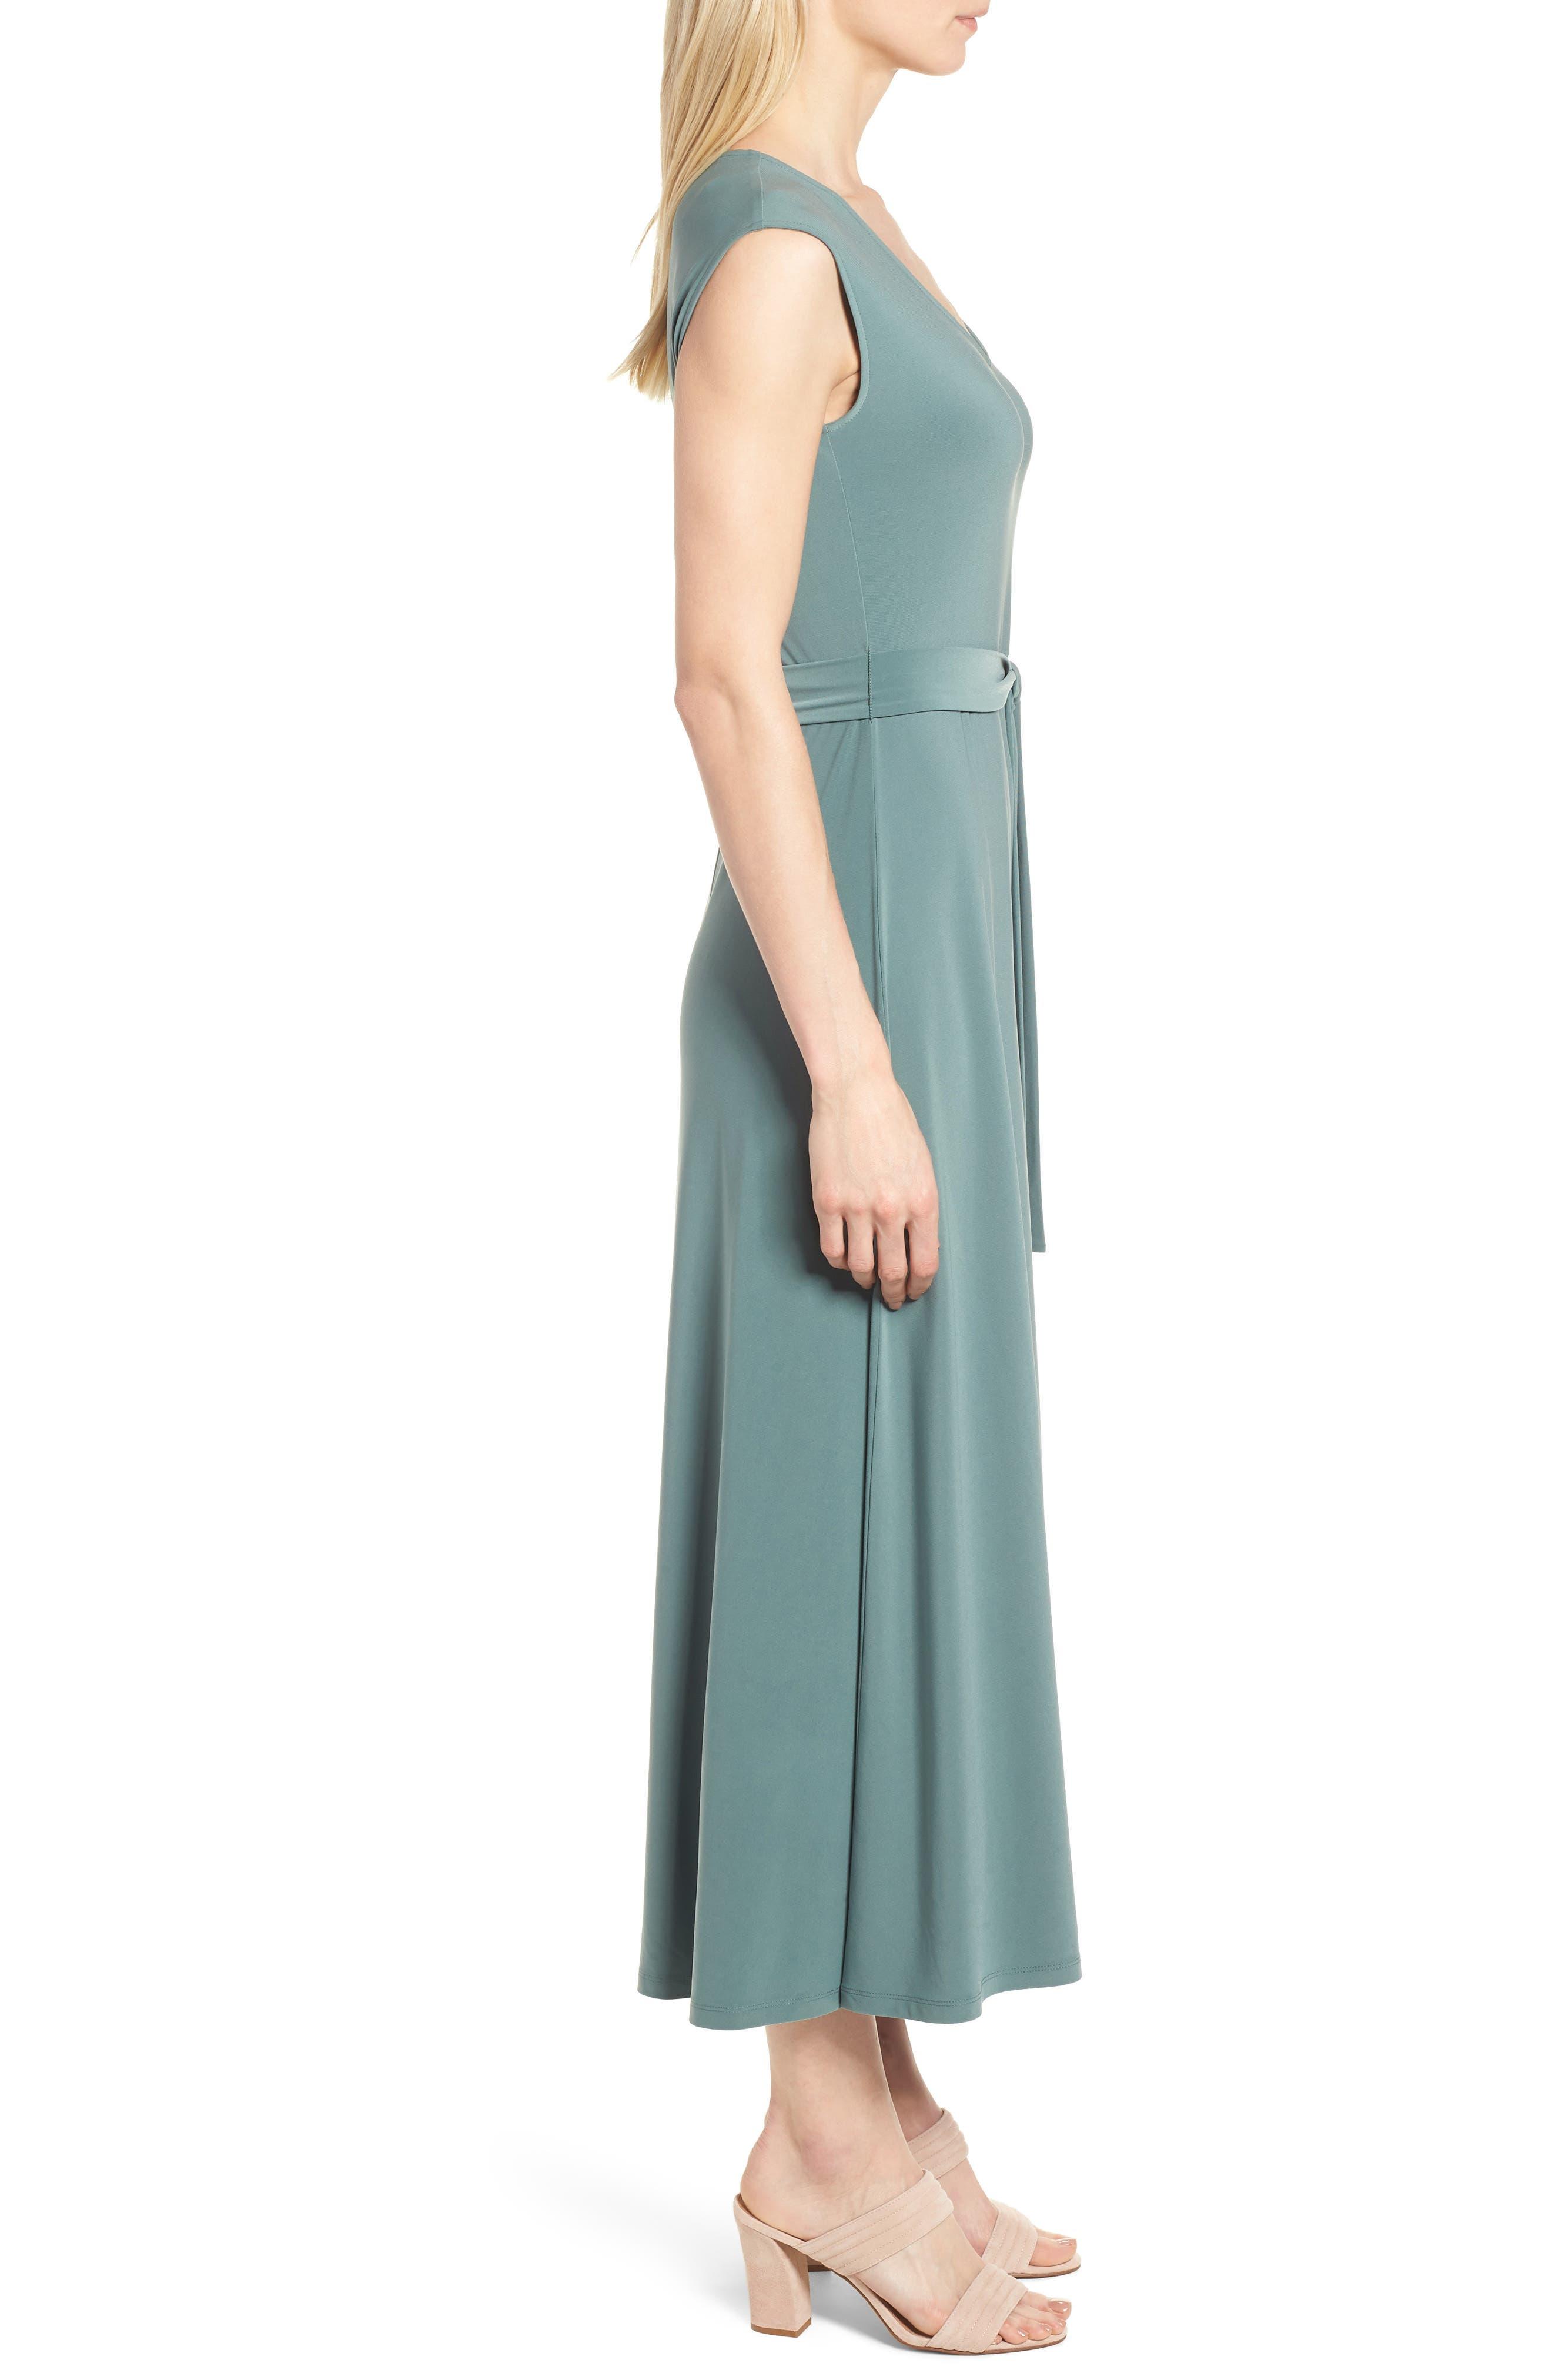 Tie Waist Maxi Dress,                             Alternate thumbnail 3, color,                             738-Tropic Moss